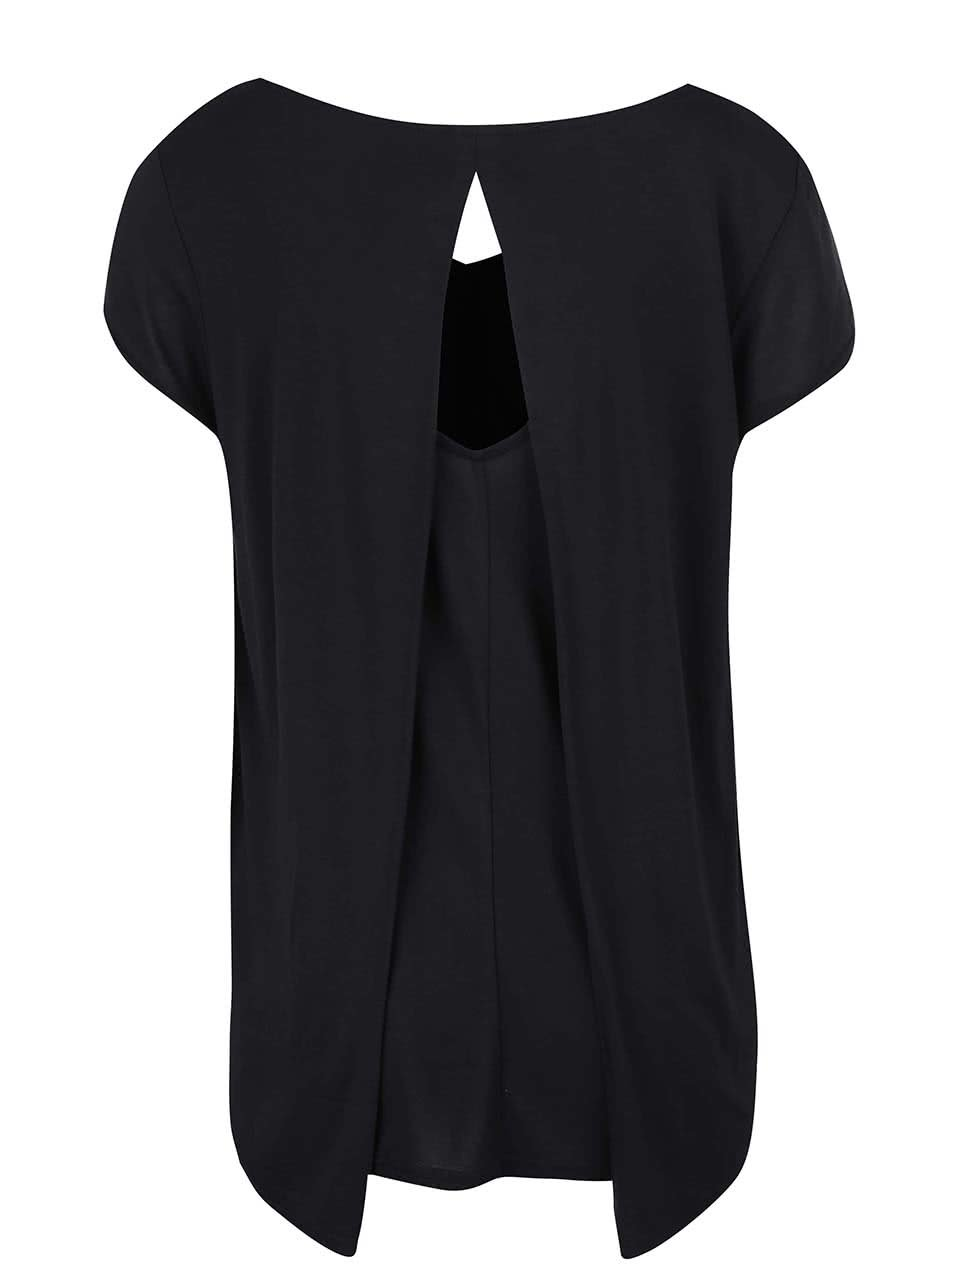 610fbd32658f Čierne dámske tričko s výstrihom na chrbte Bench Observe ...